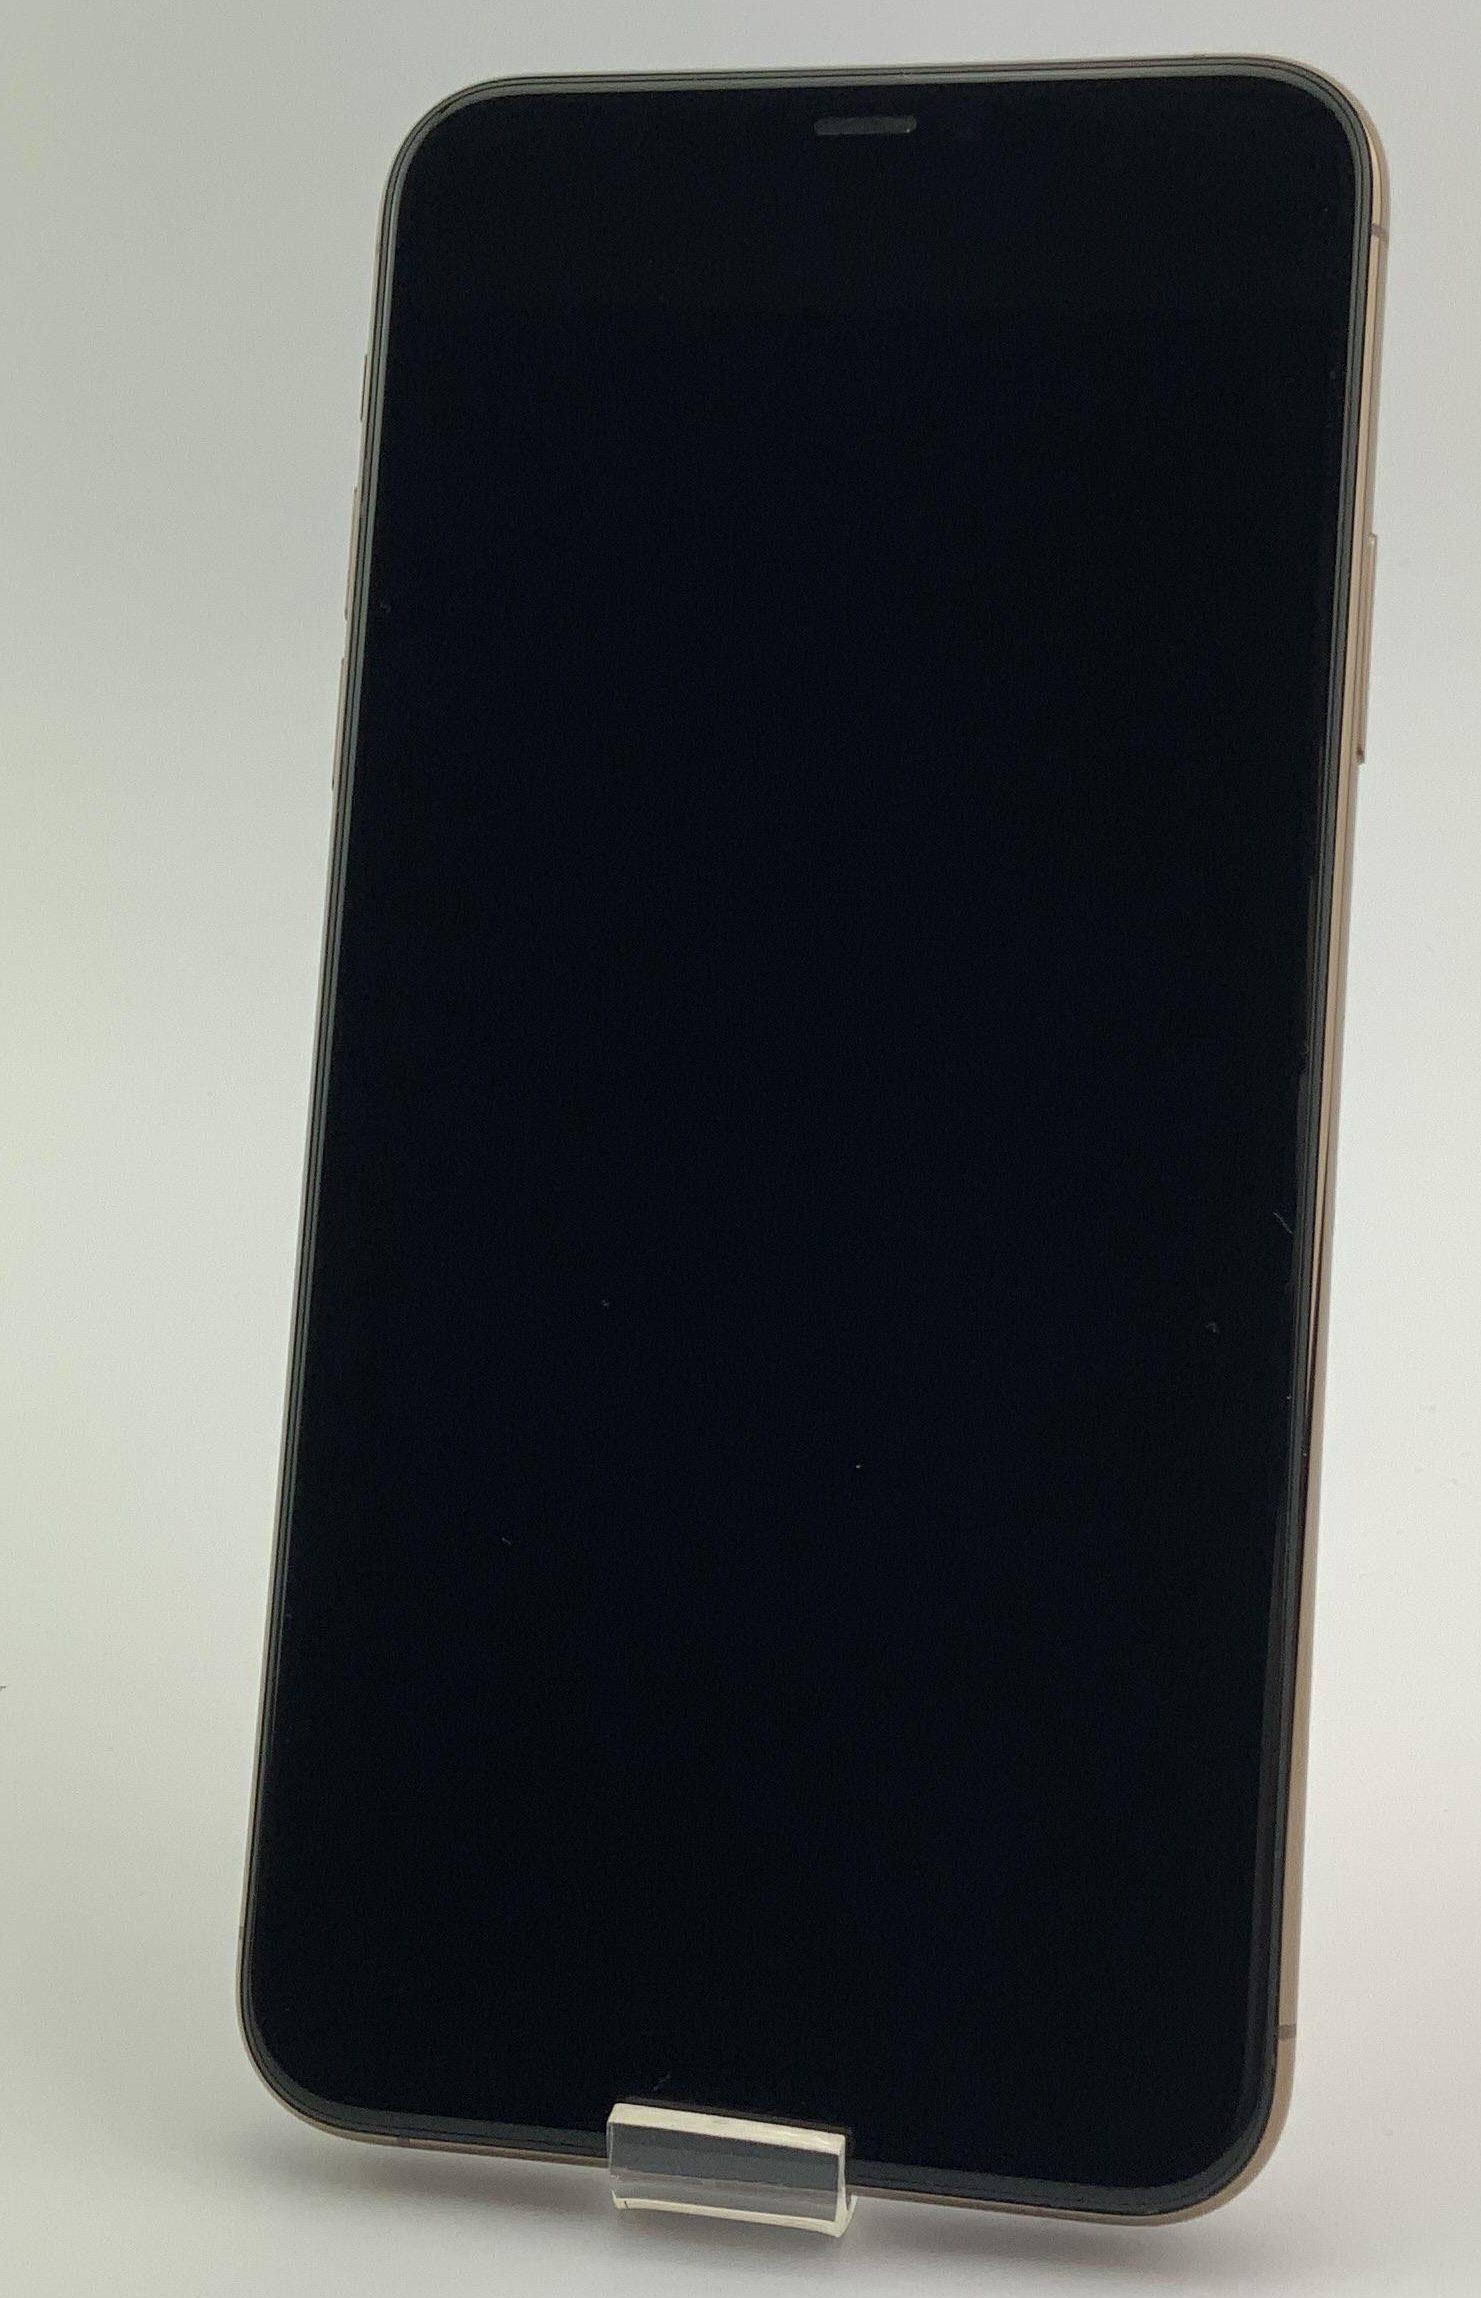 iPhone 11 Pro Max 256GB, 256GB, Gold, immagine 1